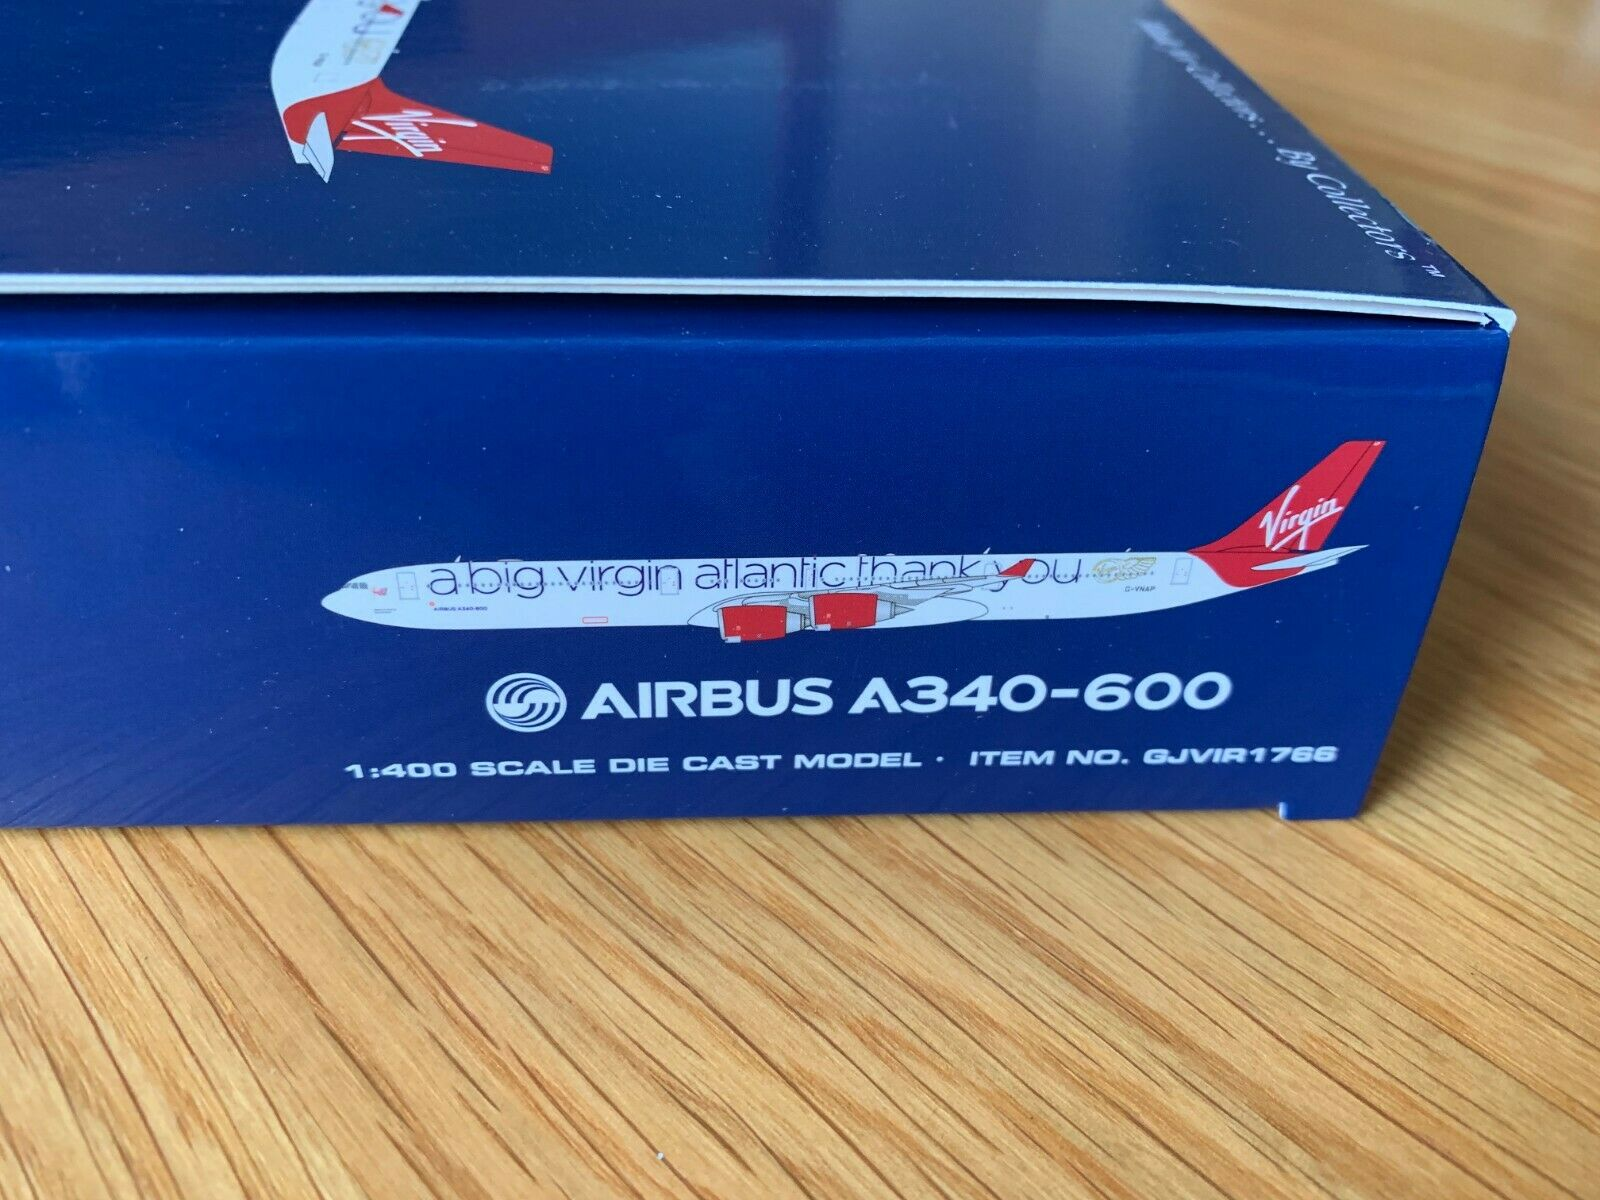 Virgin Atlantic Airbus A340-600 A340-600 A340-600 G-Vnap Gemini Jets Gjvir1766 1 400 Groß Danke 3bd09c